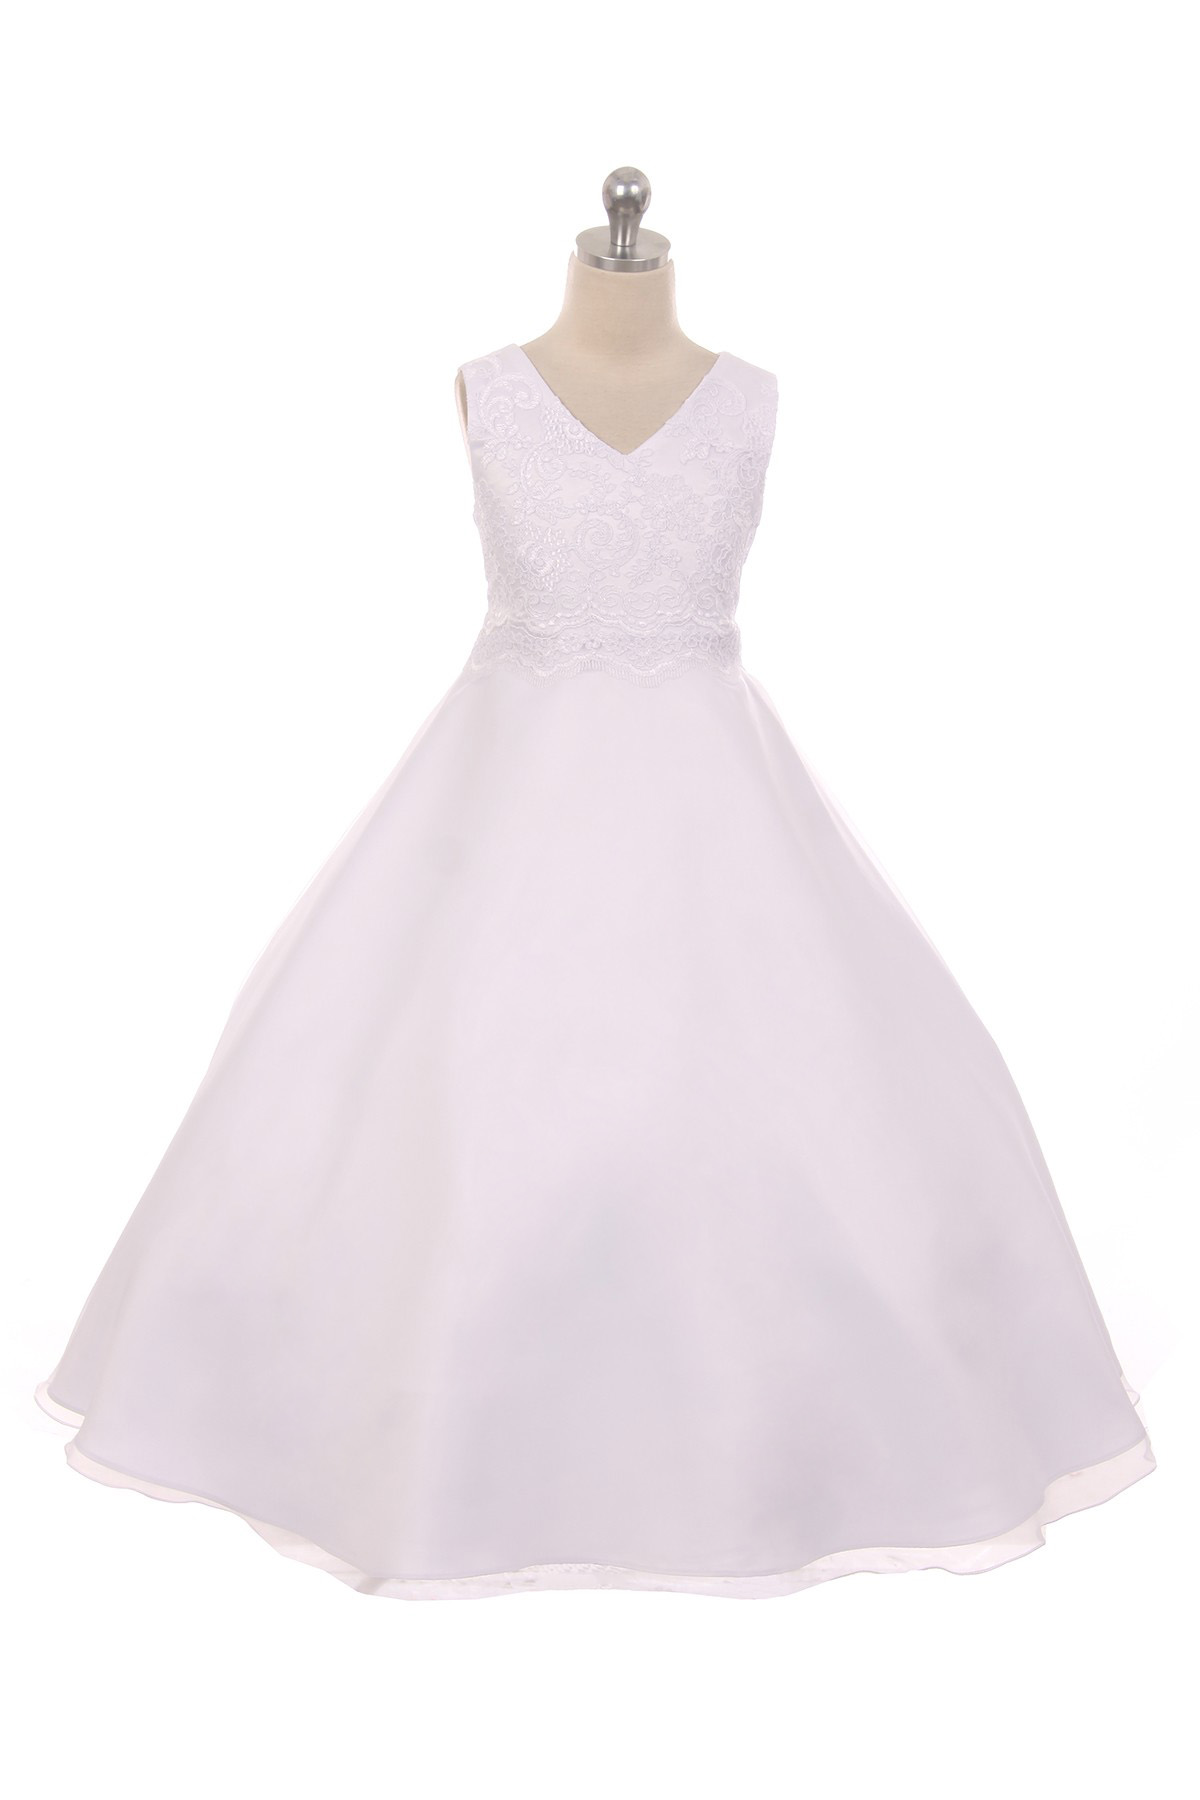 d69eab03f3fc Appliqué Lace Bodice Full Girls Dress - White - Grandma s Little Darlings